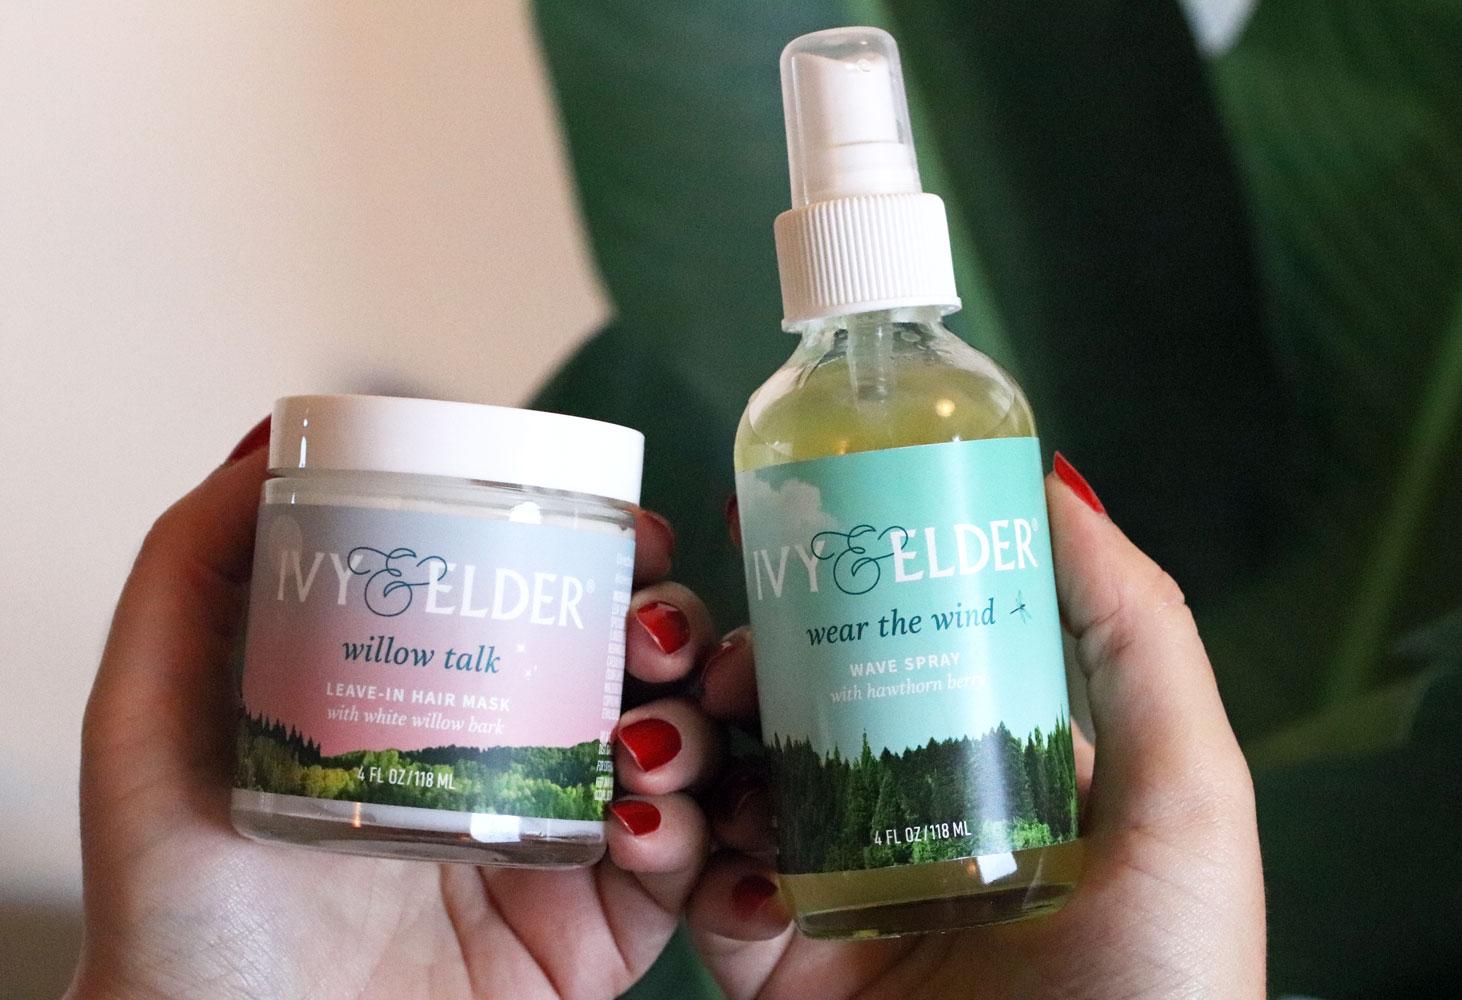 Ivy & Elder cruelty free hair products